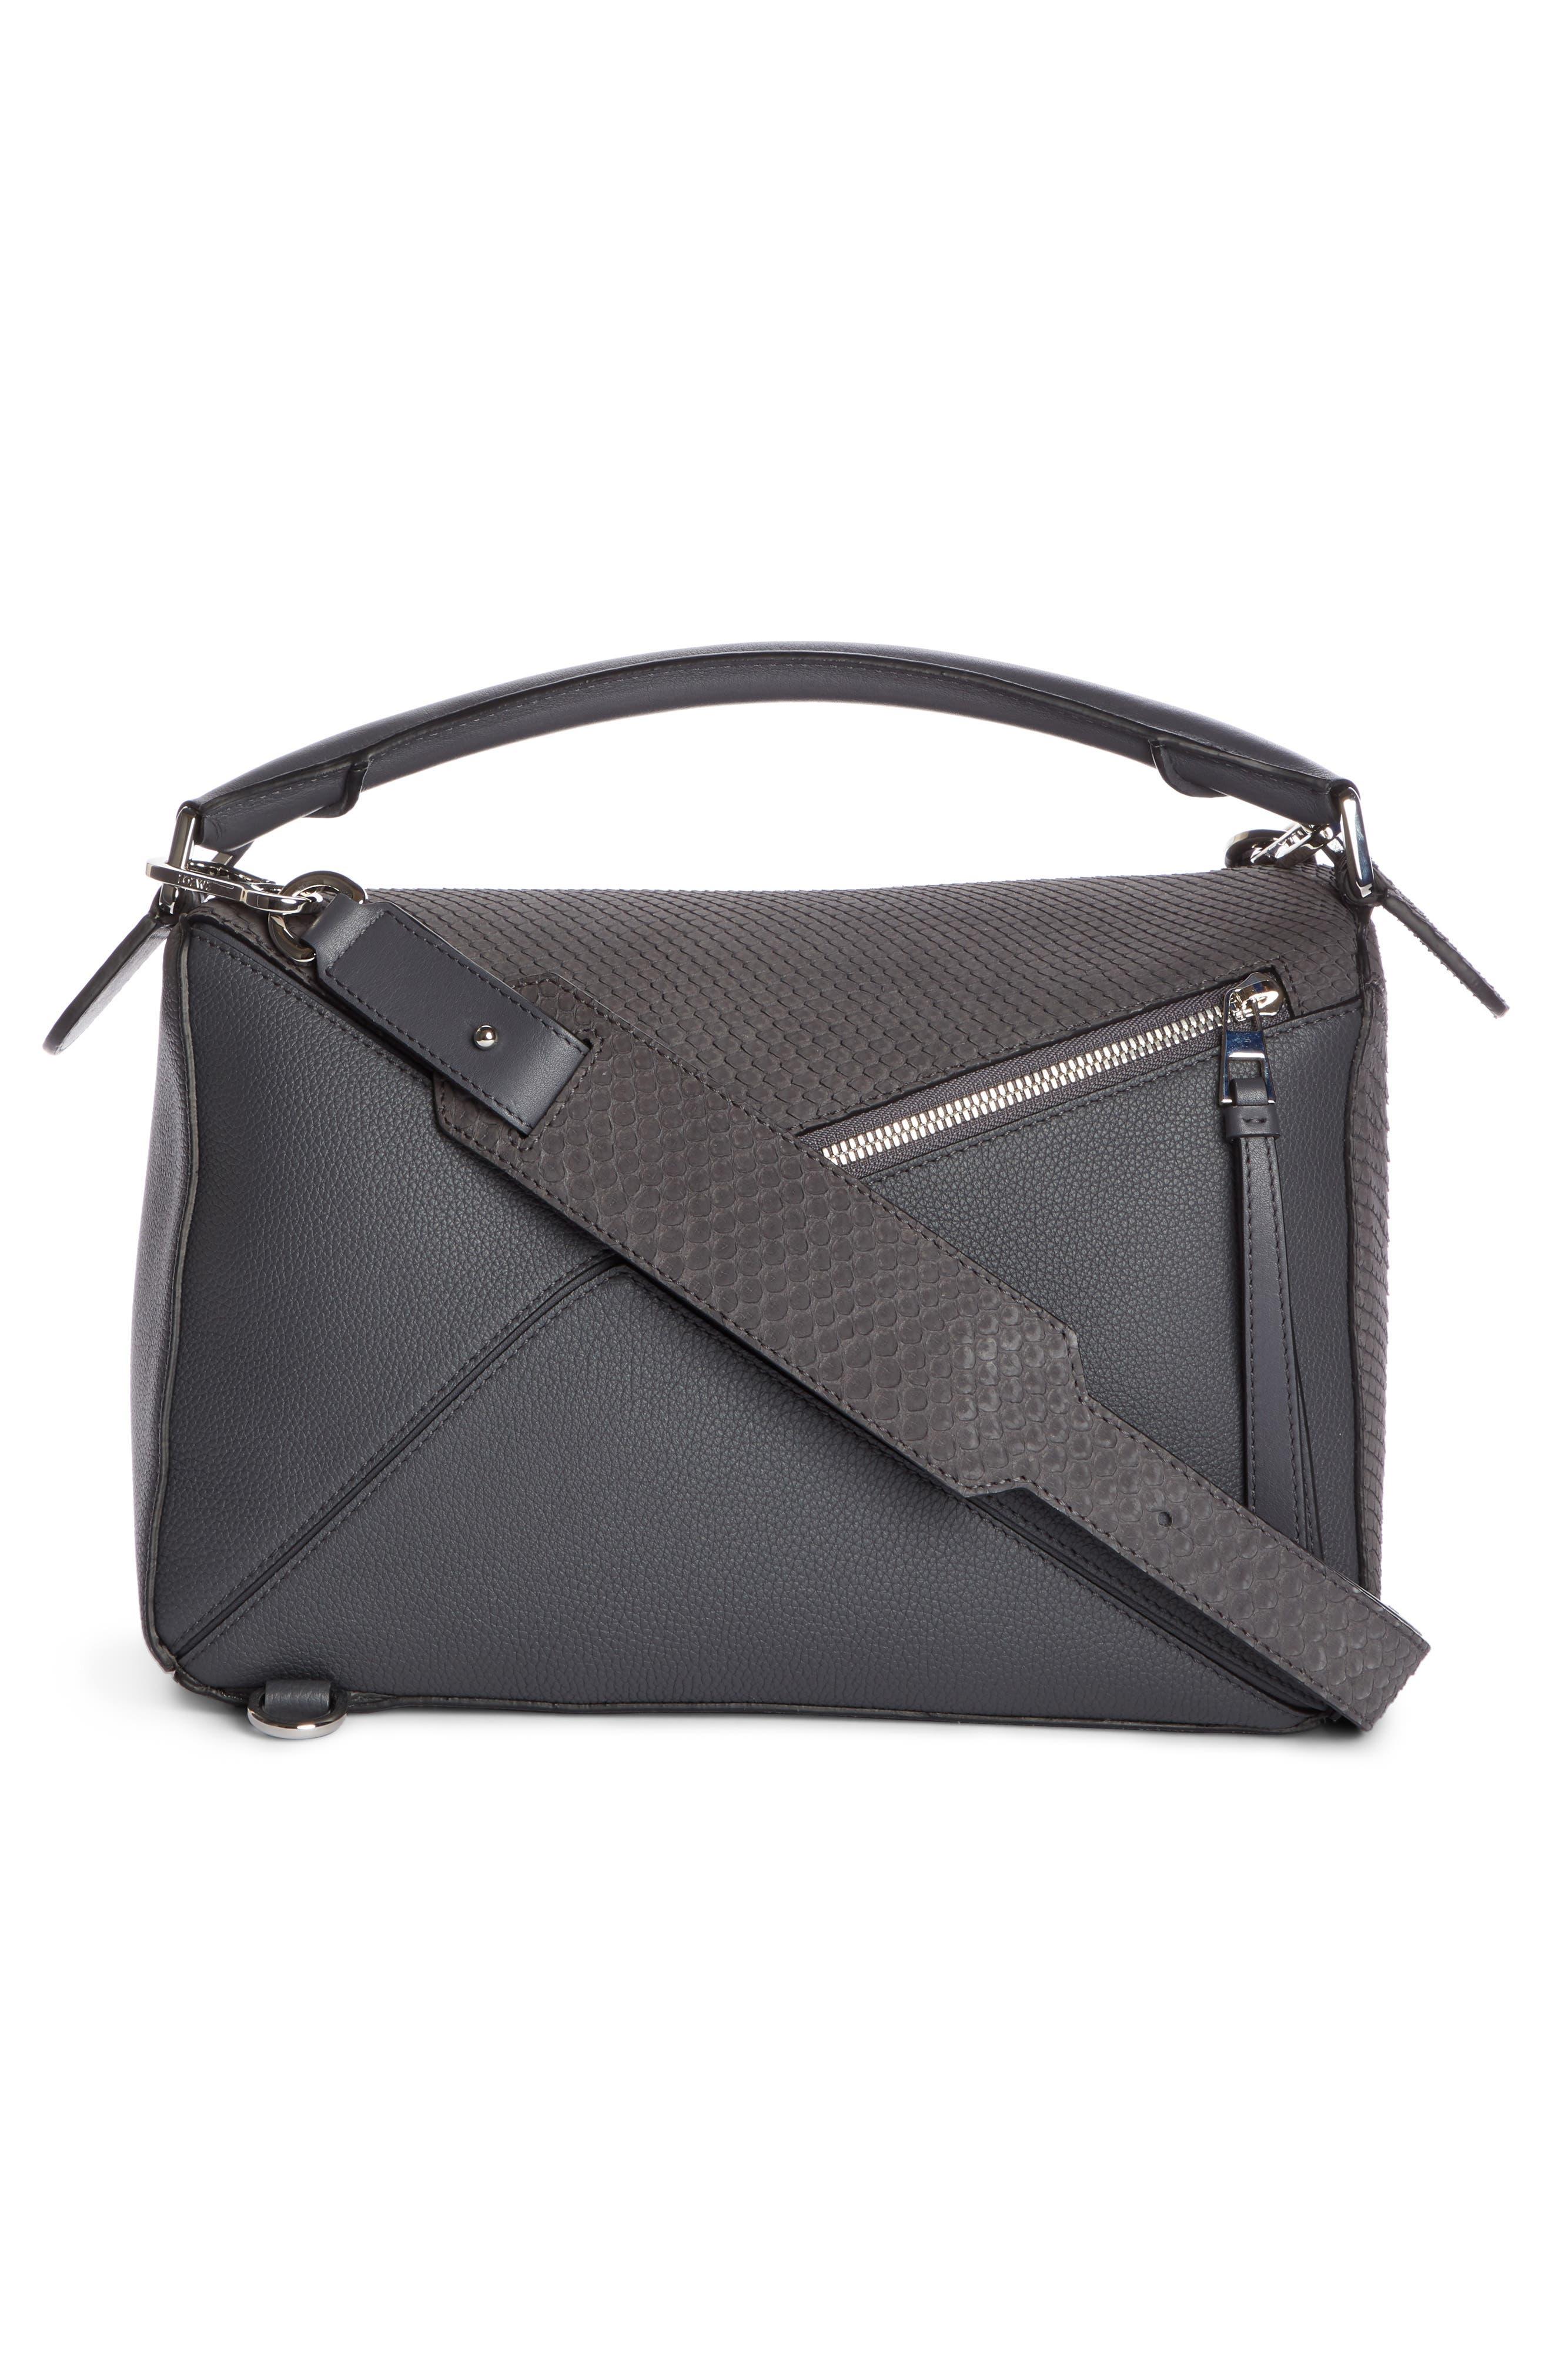 Medium Puzzle Leather Shoulder Bag,                             Alternate thumbnail 2, color,                             ANTHRACITE